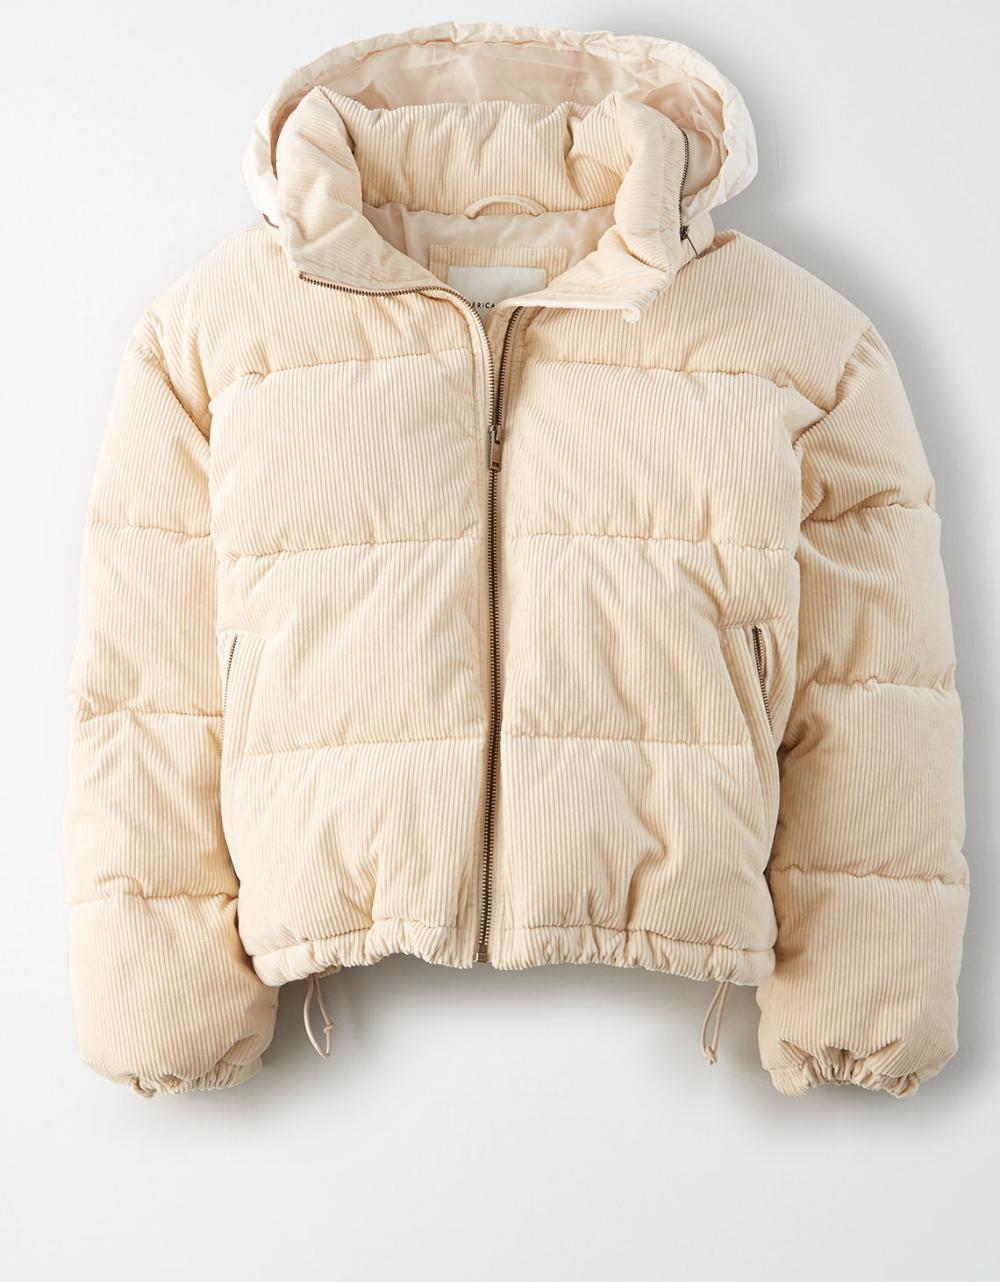 Aeo Corduroy Puffer Jacket Winter Jacket Outfits Puffer Jacket Outfit Tween Outfits [ 1282 x 1000 Pixel ]